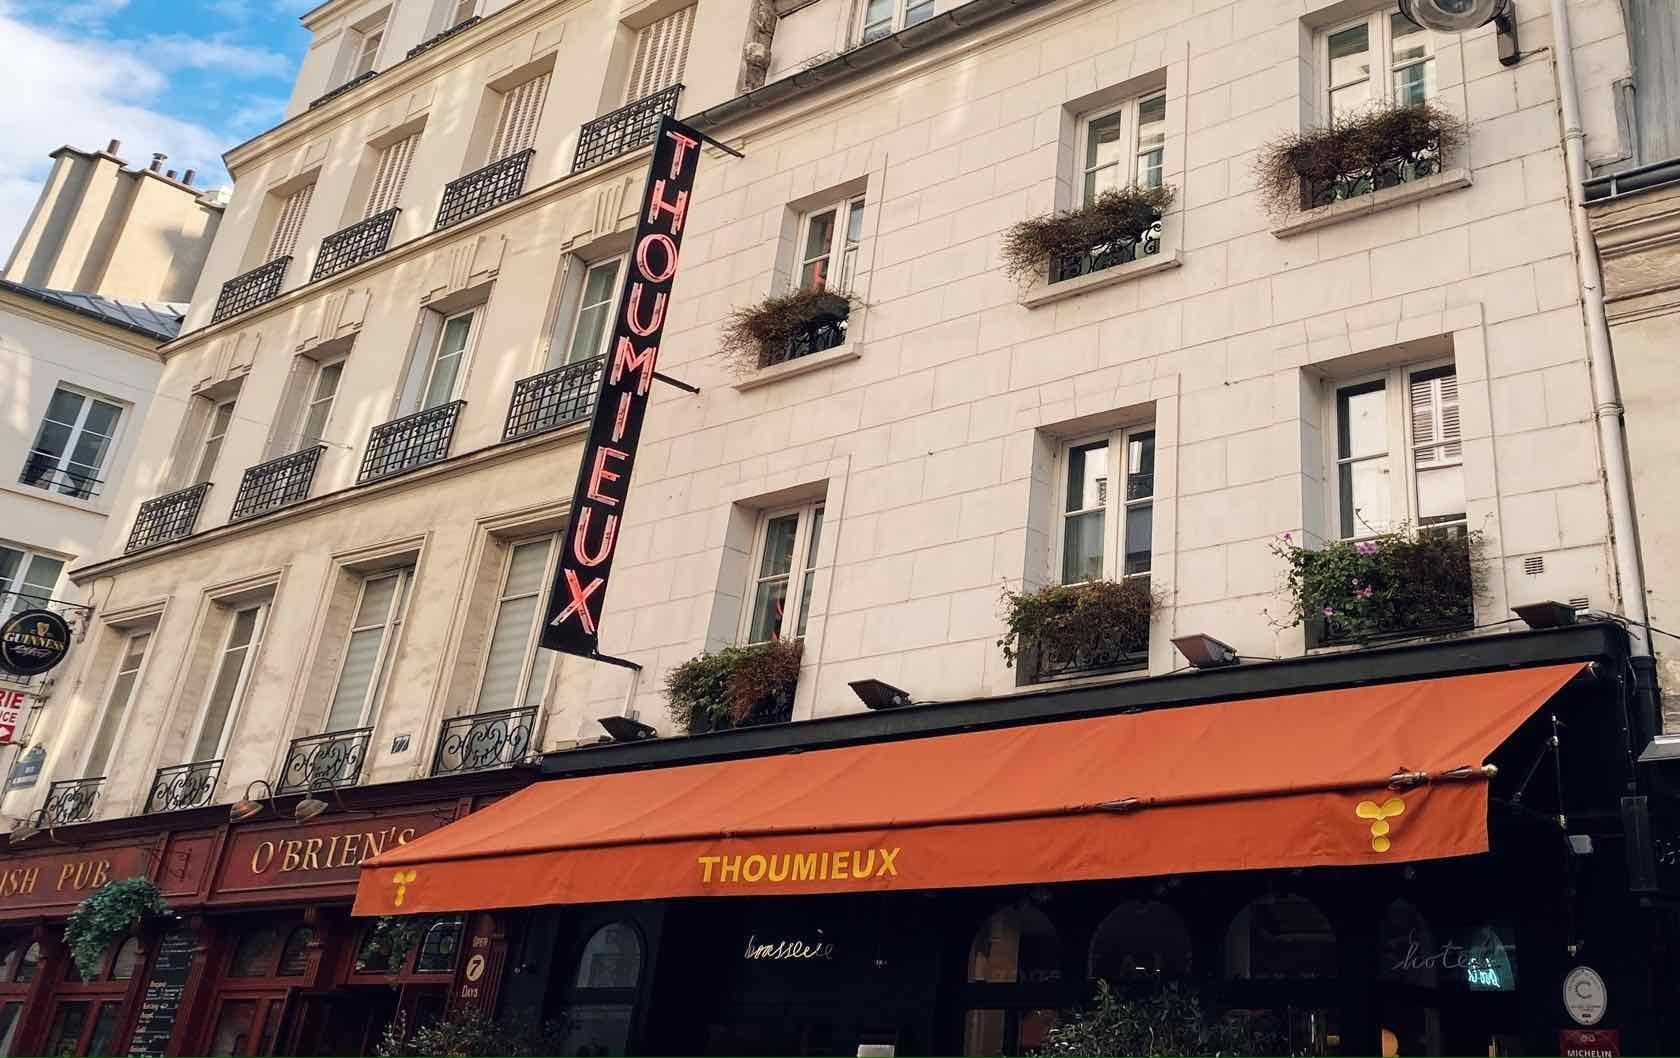 Finedining restaurants in the 7th arrondissement eiffel